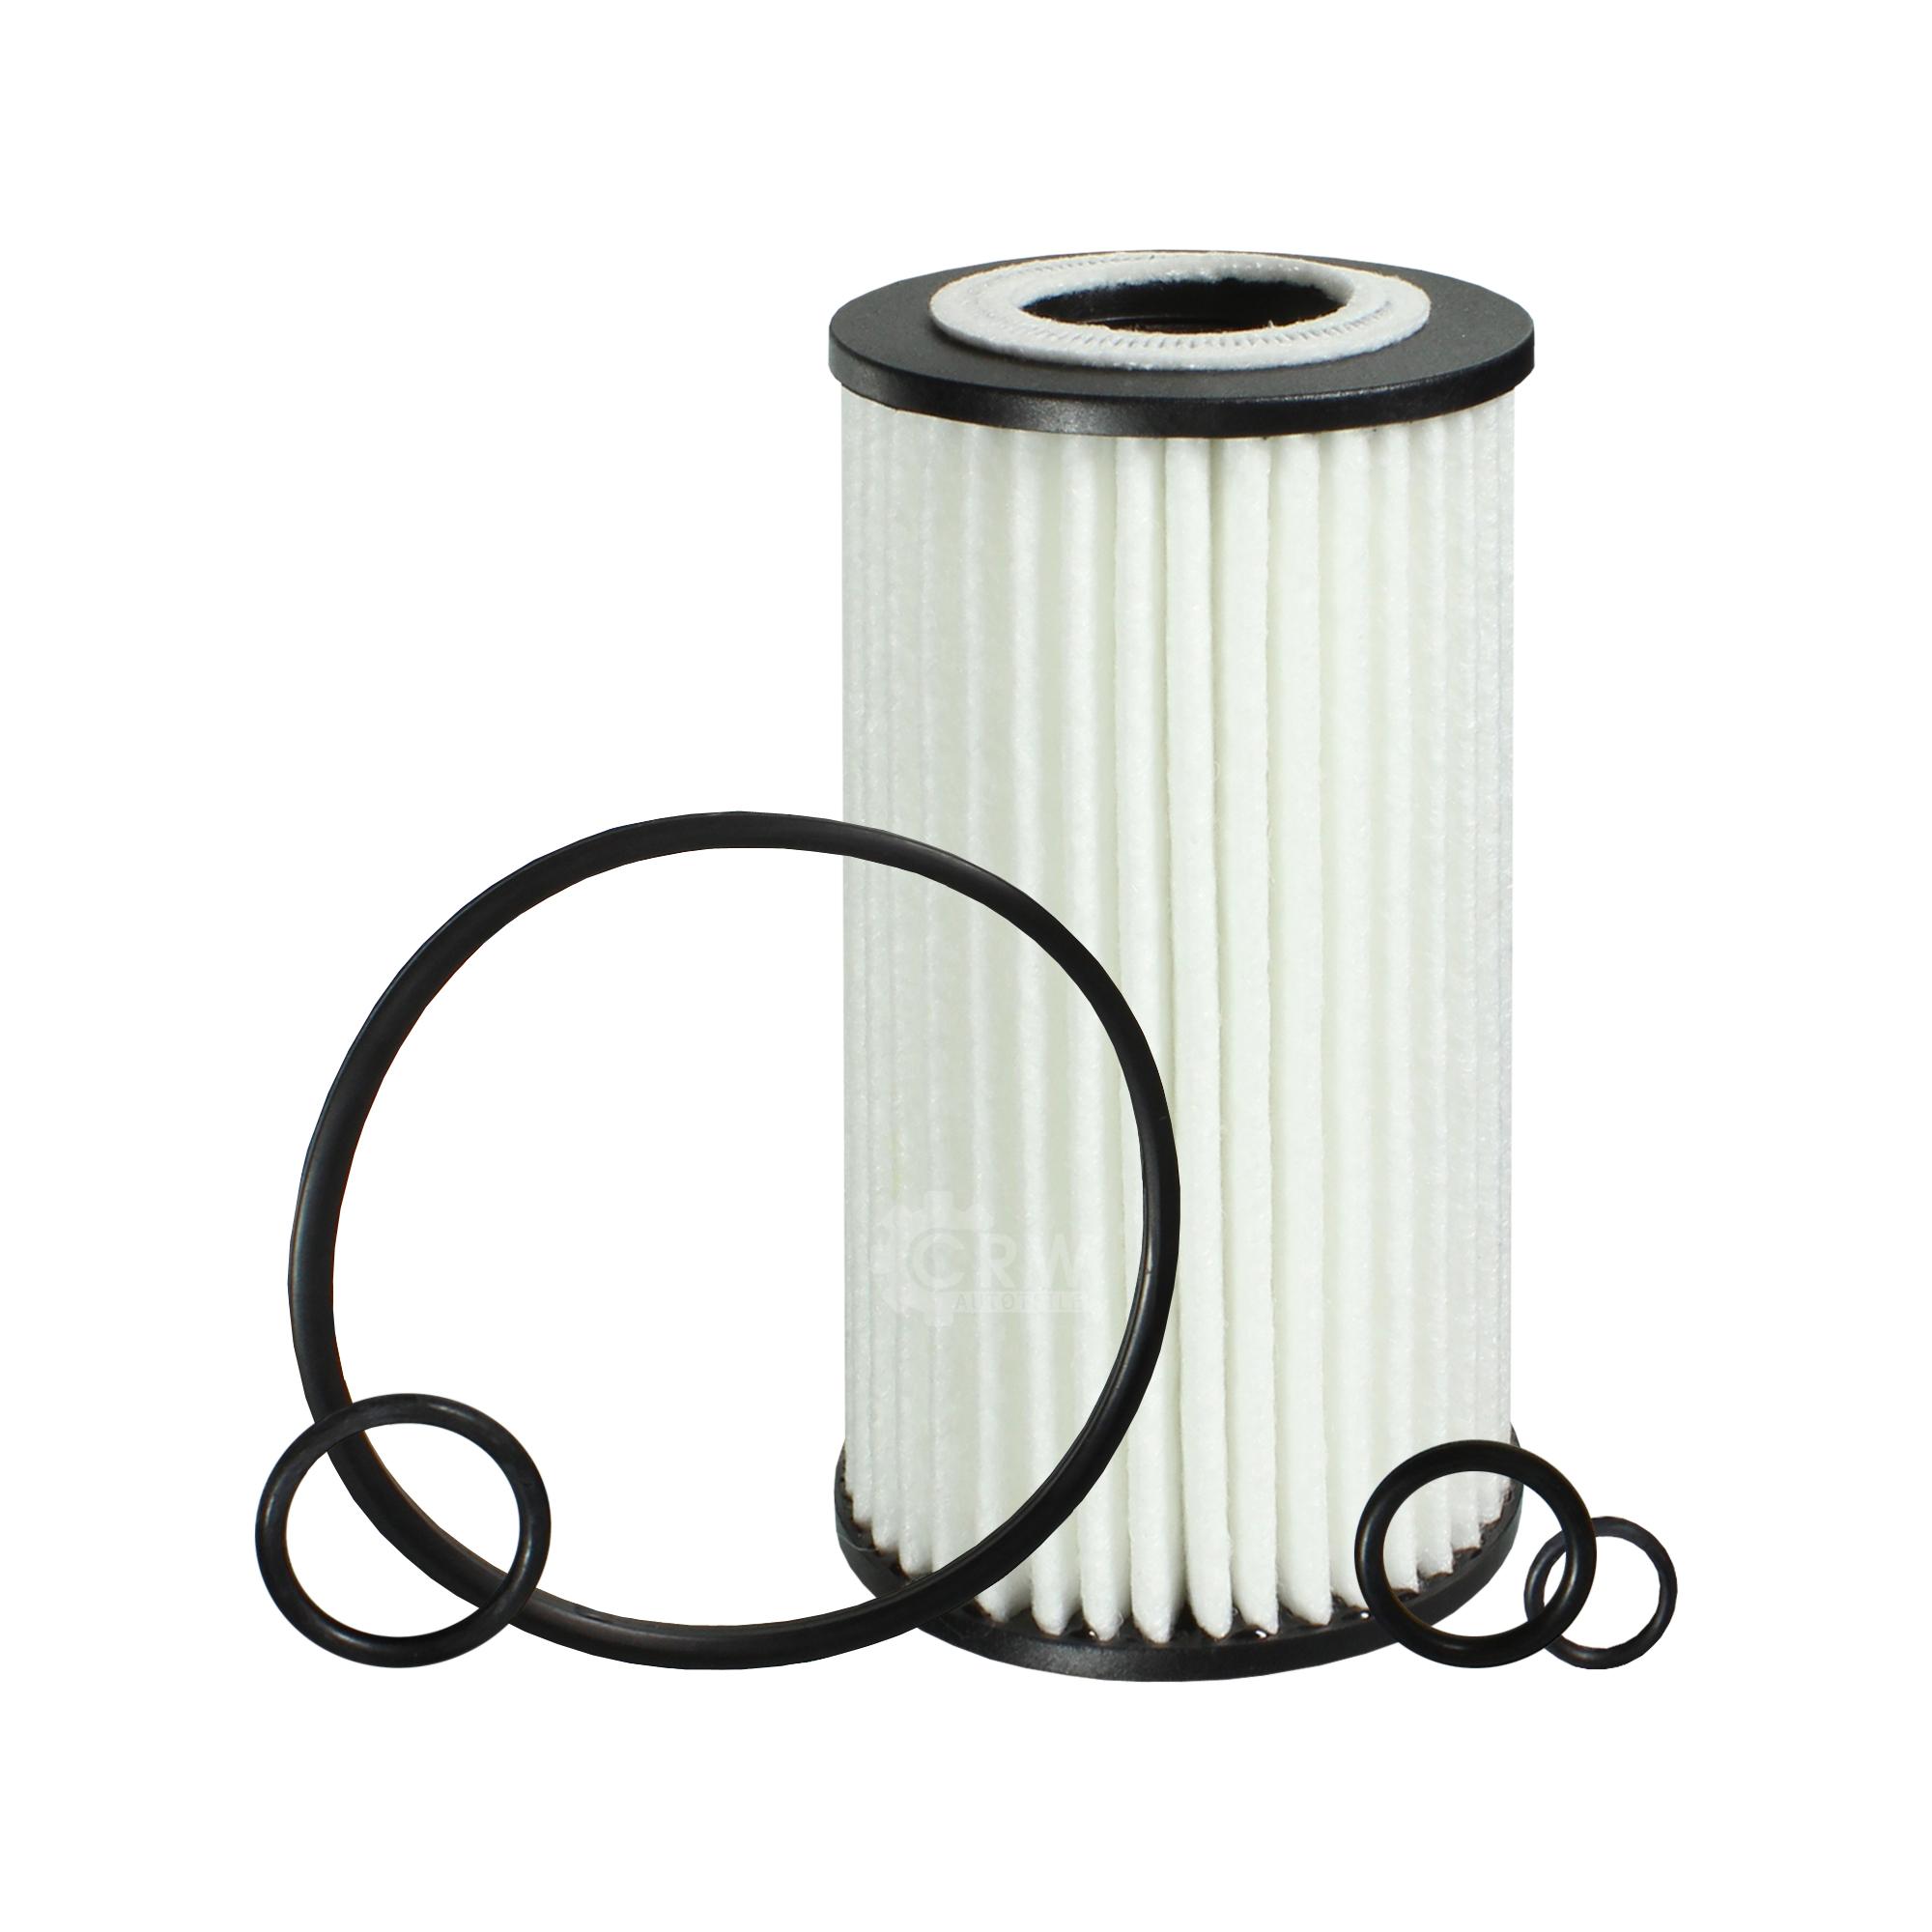 10l-paquete-de-inspeccion-mercedes-229-51-aceite-del-motor-5w-30-hombre-filtro-aceite-11125642 miniatura 6